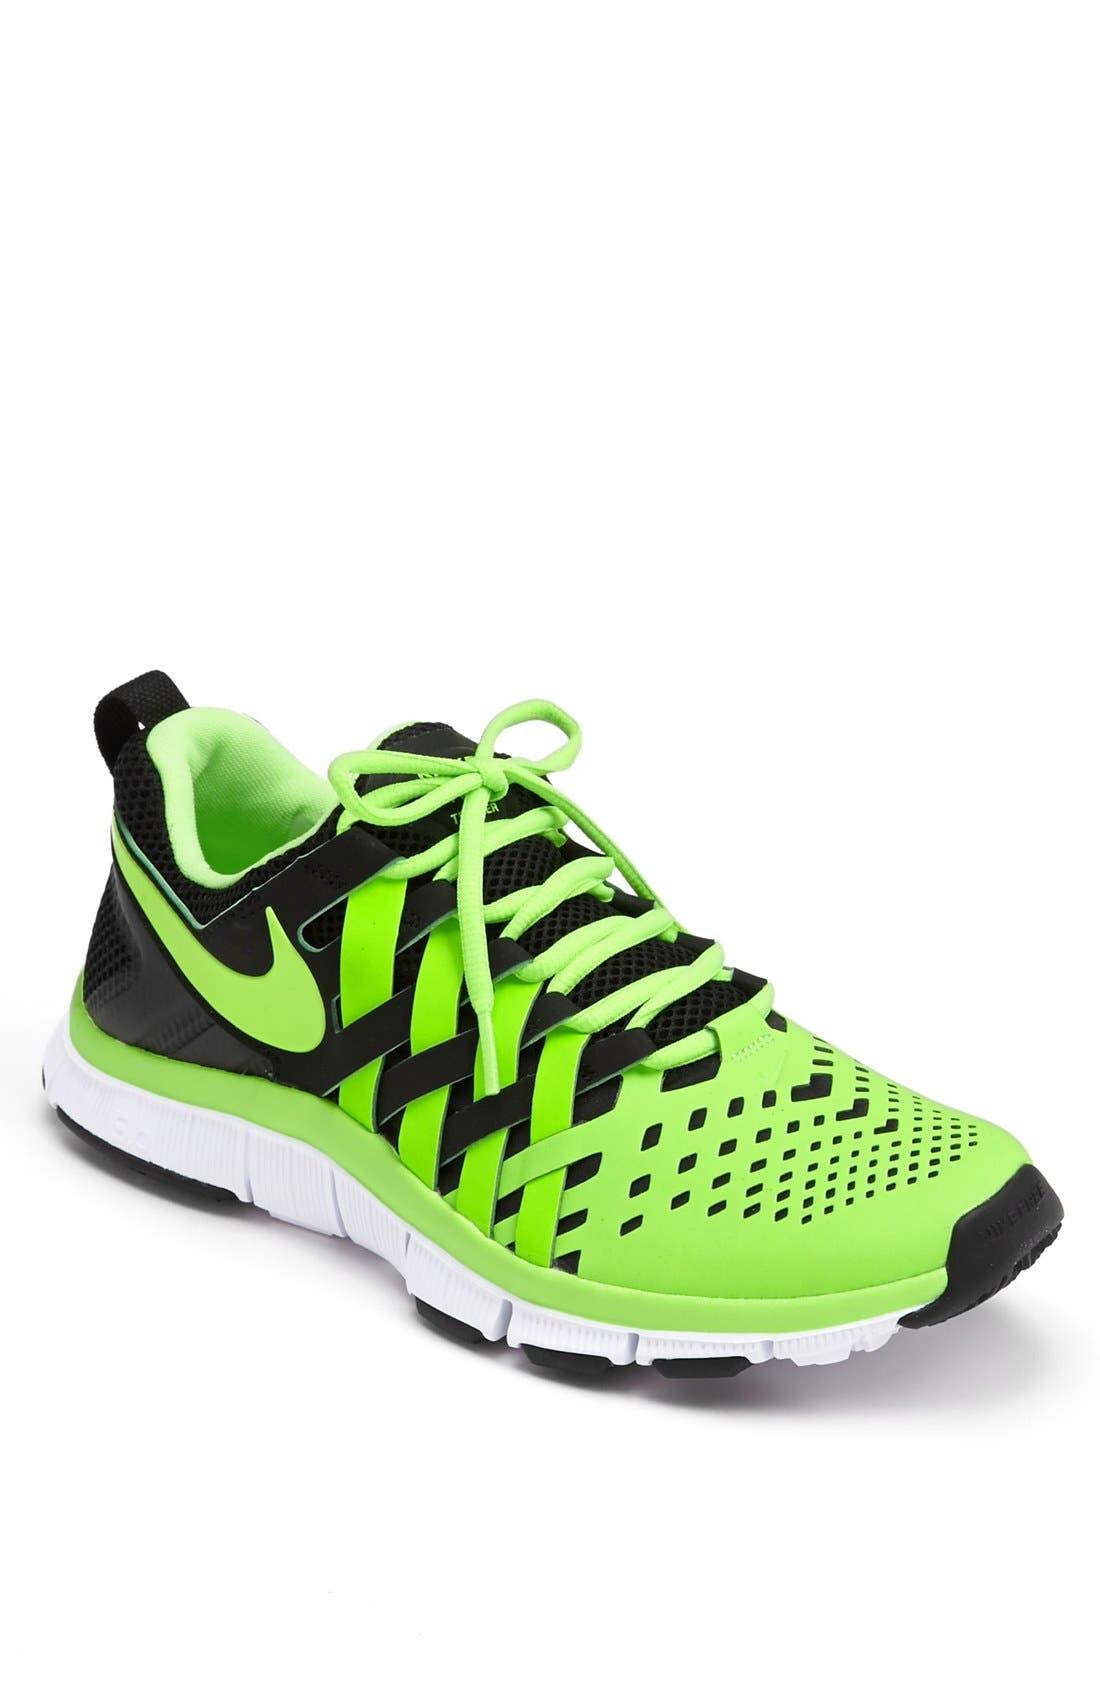 Alternate Image 1 Selected - Nike 'Free Trainer 5.0' Training Shoe (Men)